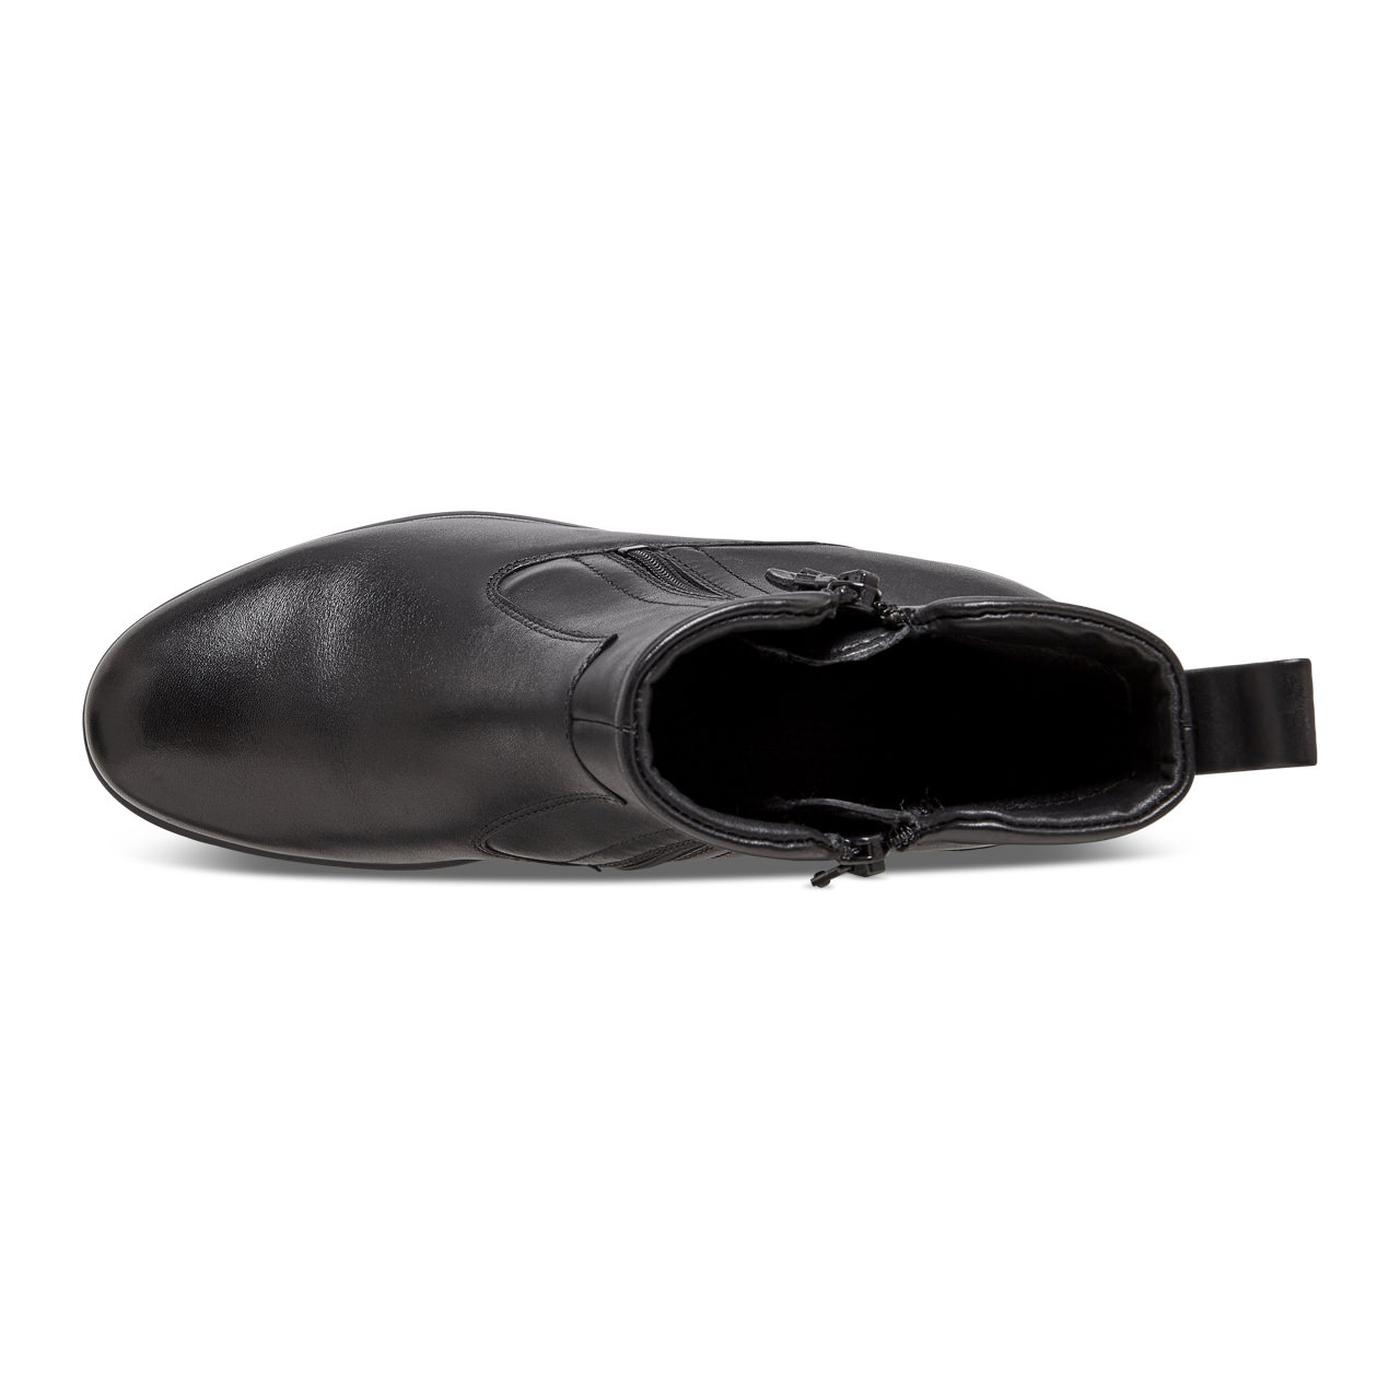 ECCO Felicia Ankle Boot